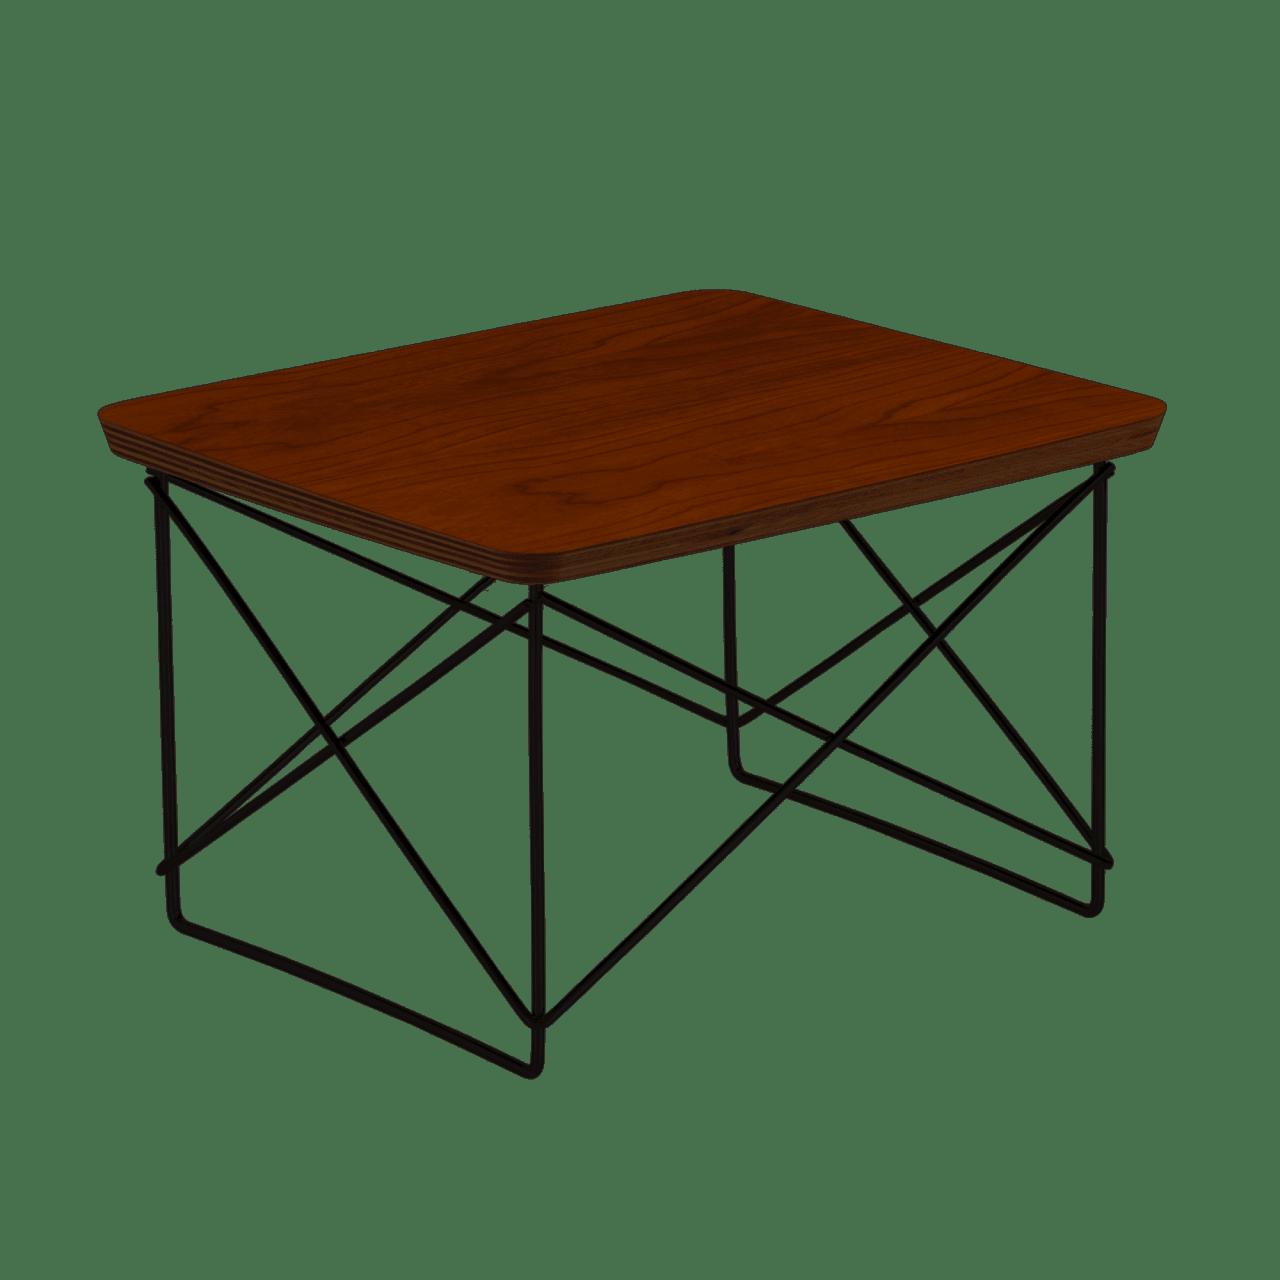 Occasional Table LTR Sapeli Mahagoni Sonderedition